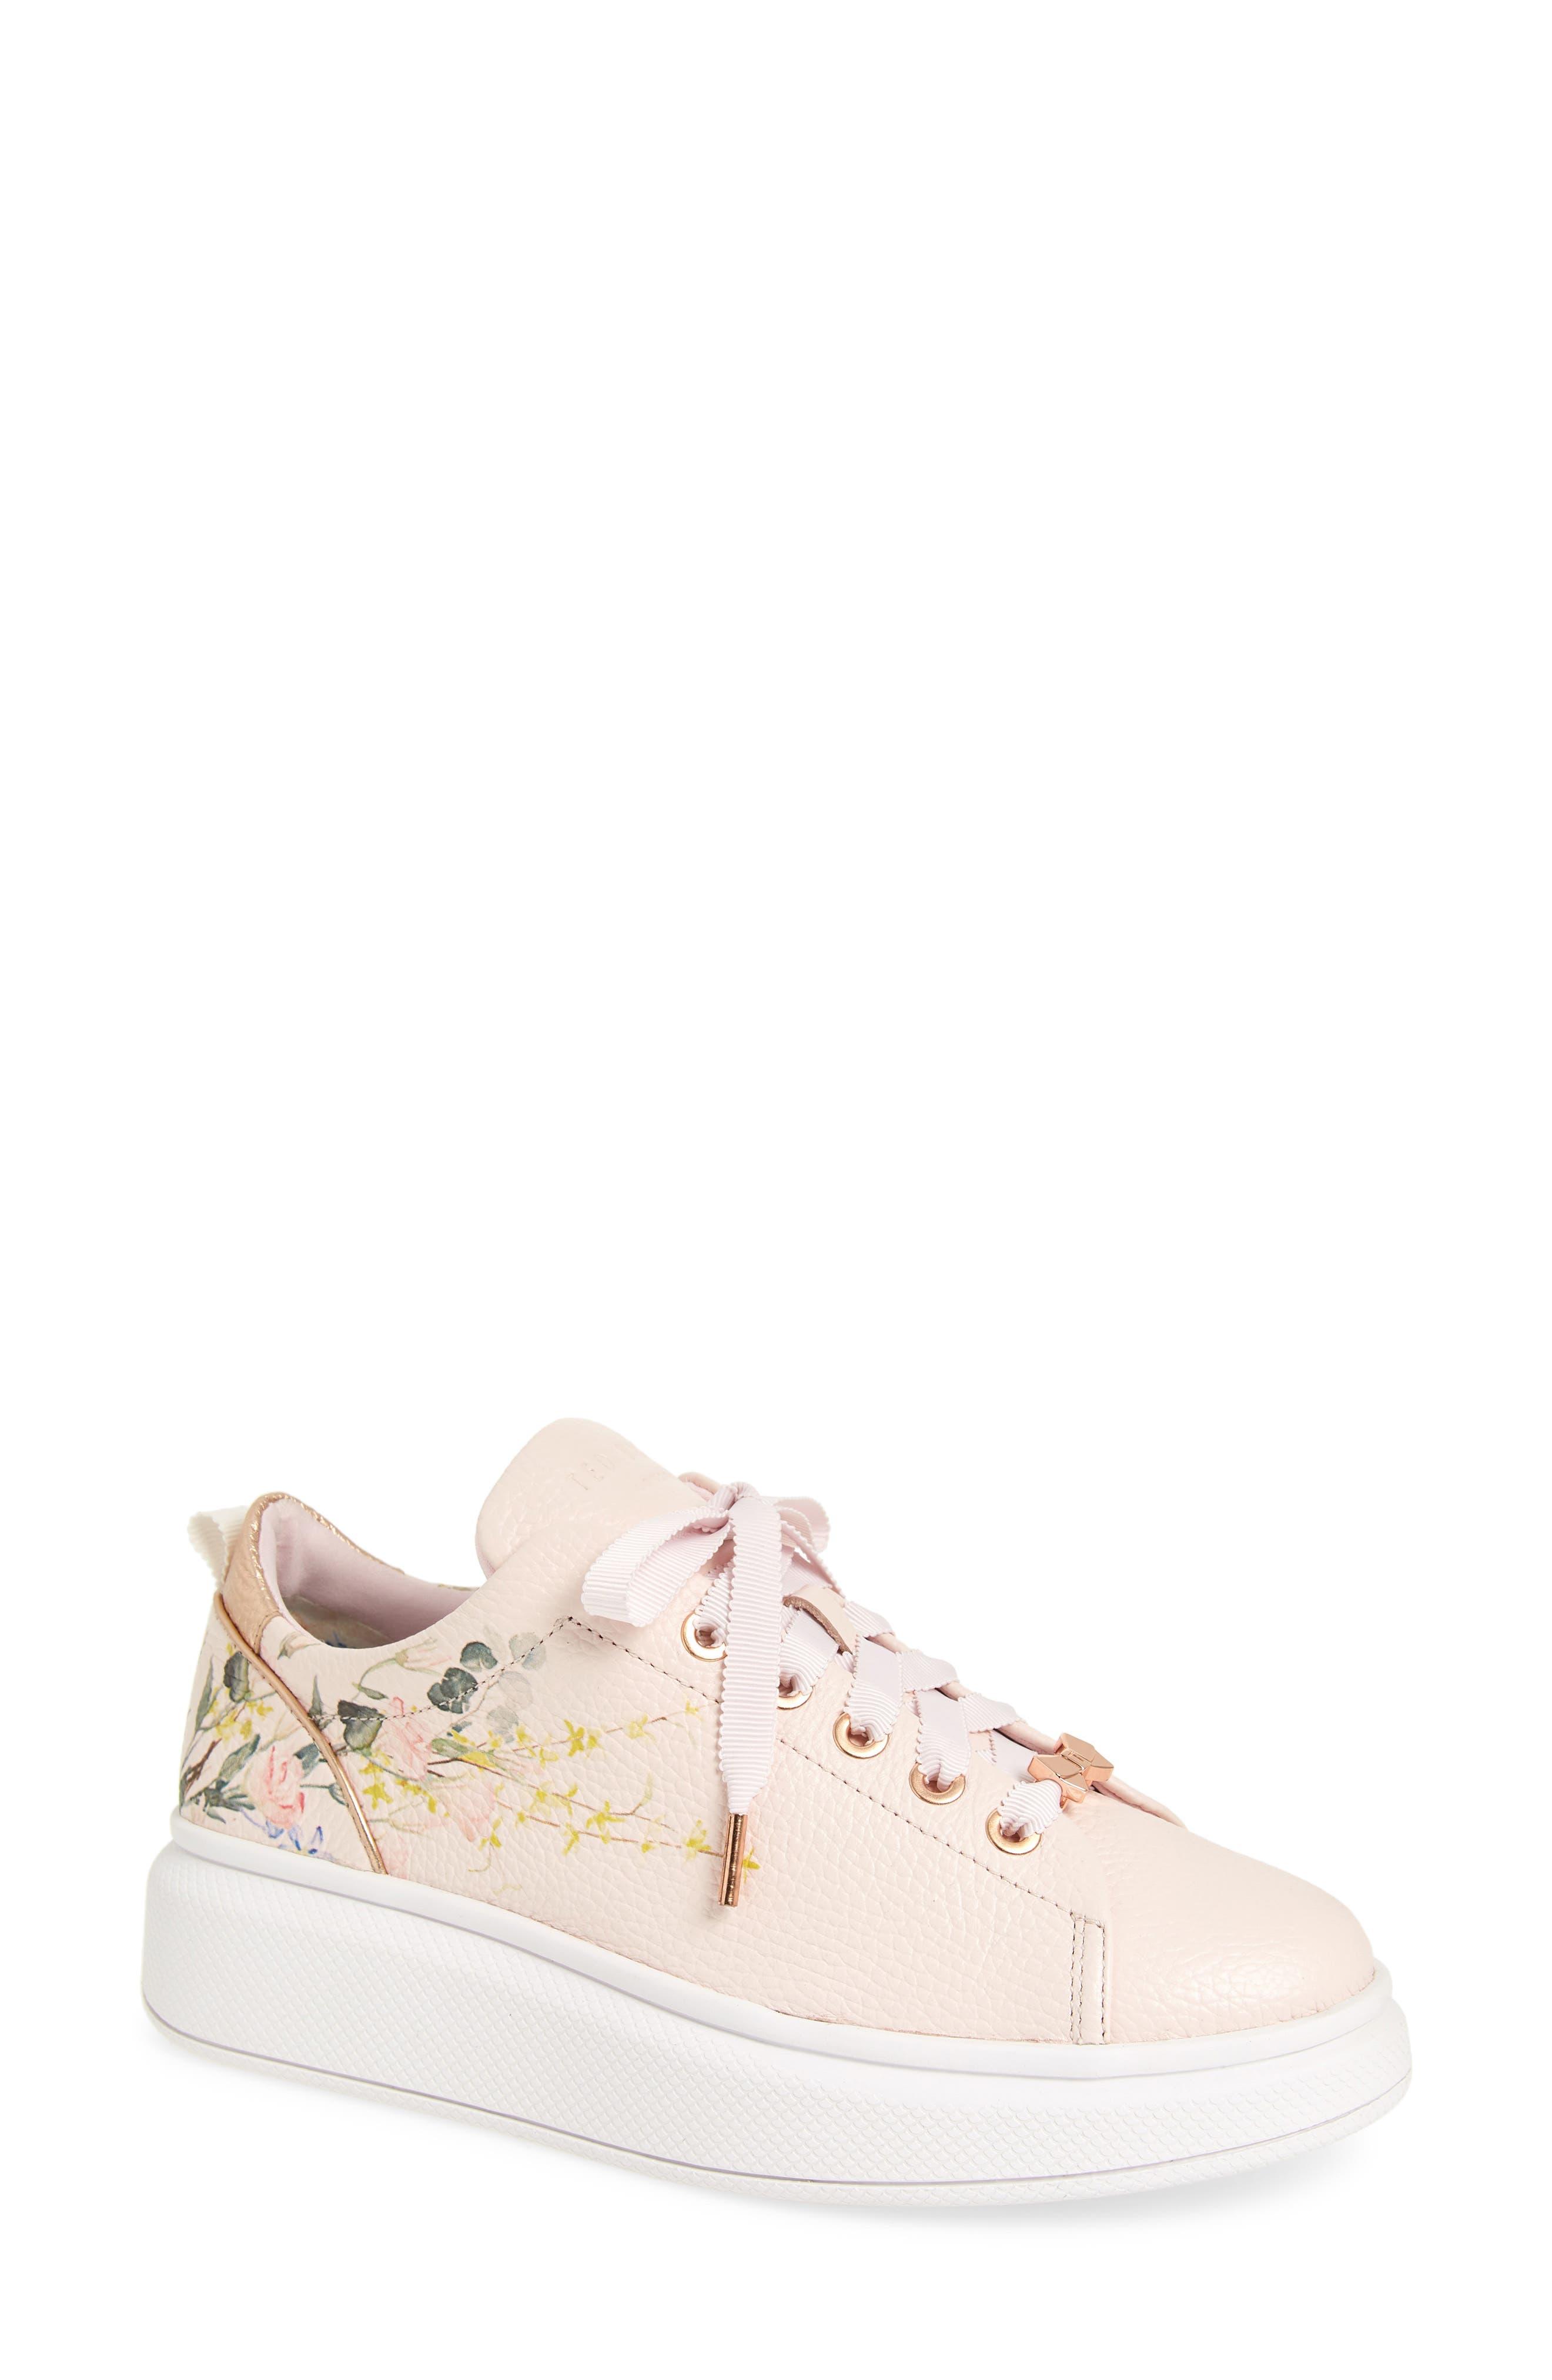 6cf621f5d01 Ted Baker London Ailbe 3 Sneaker